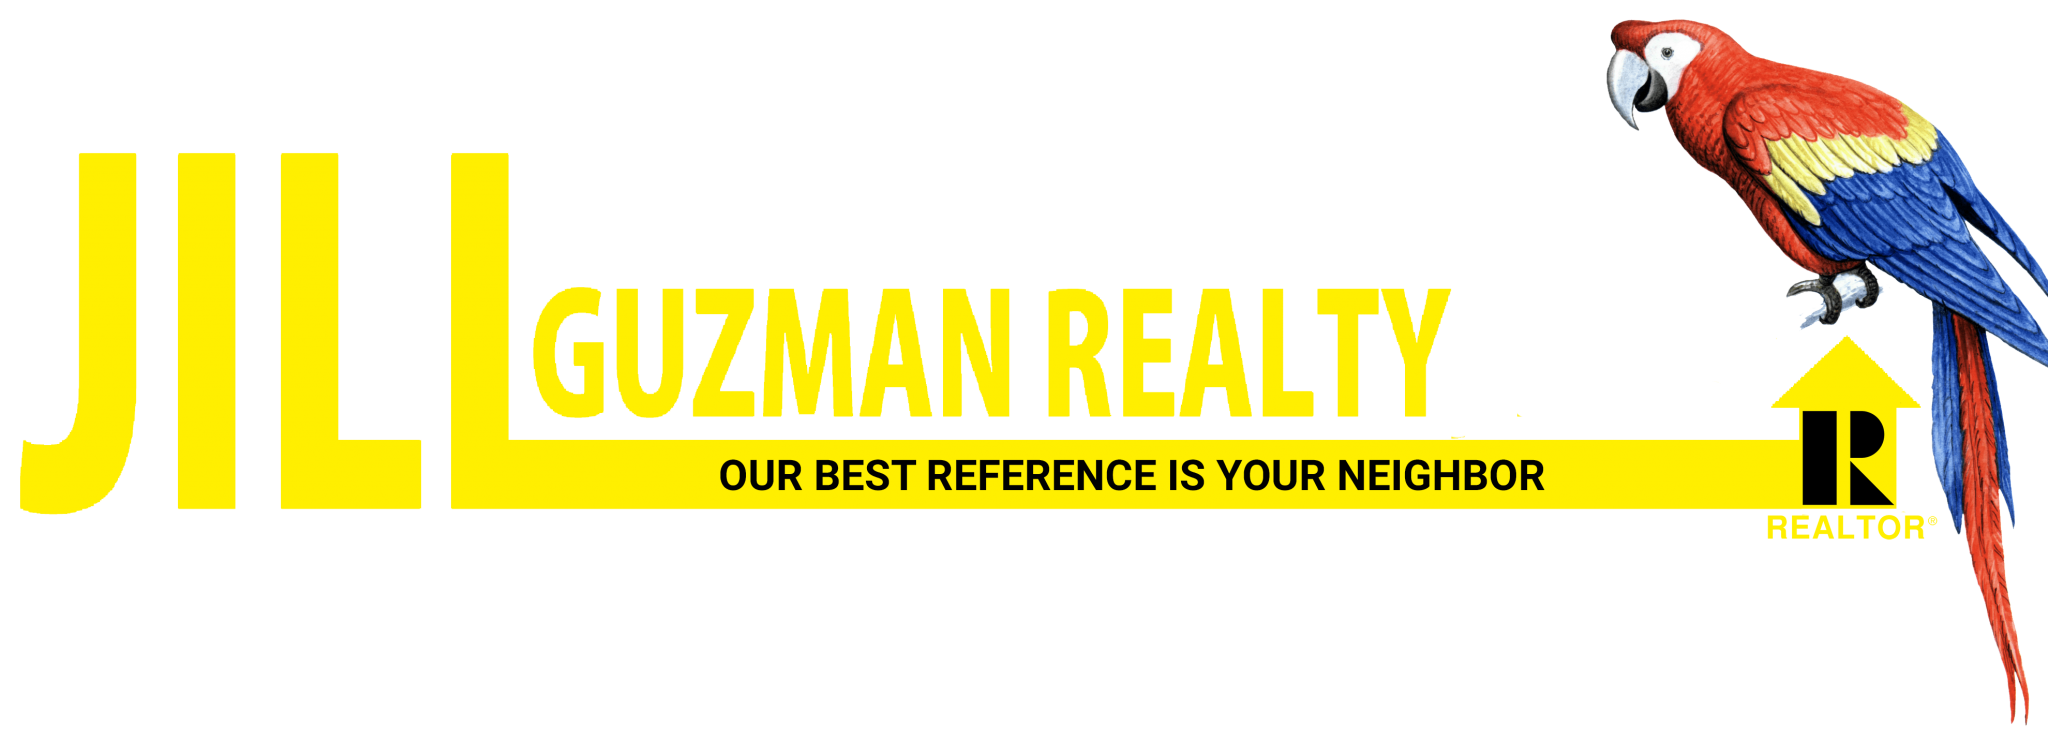 Jill Guzman Realty Logo